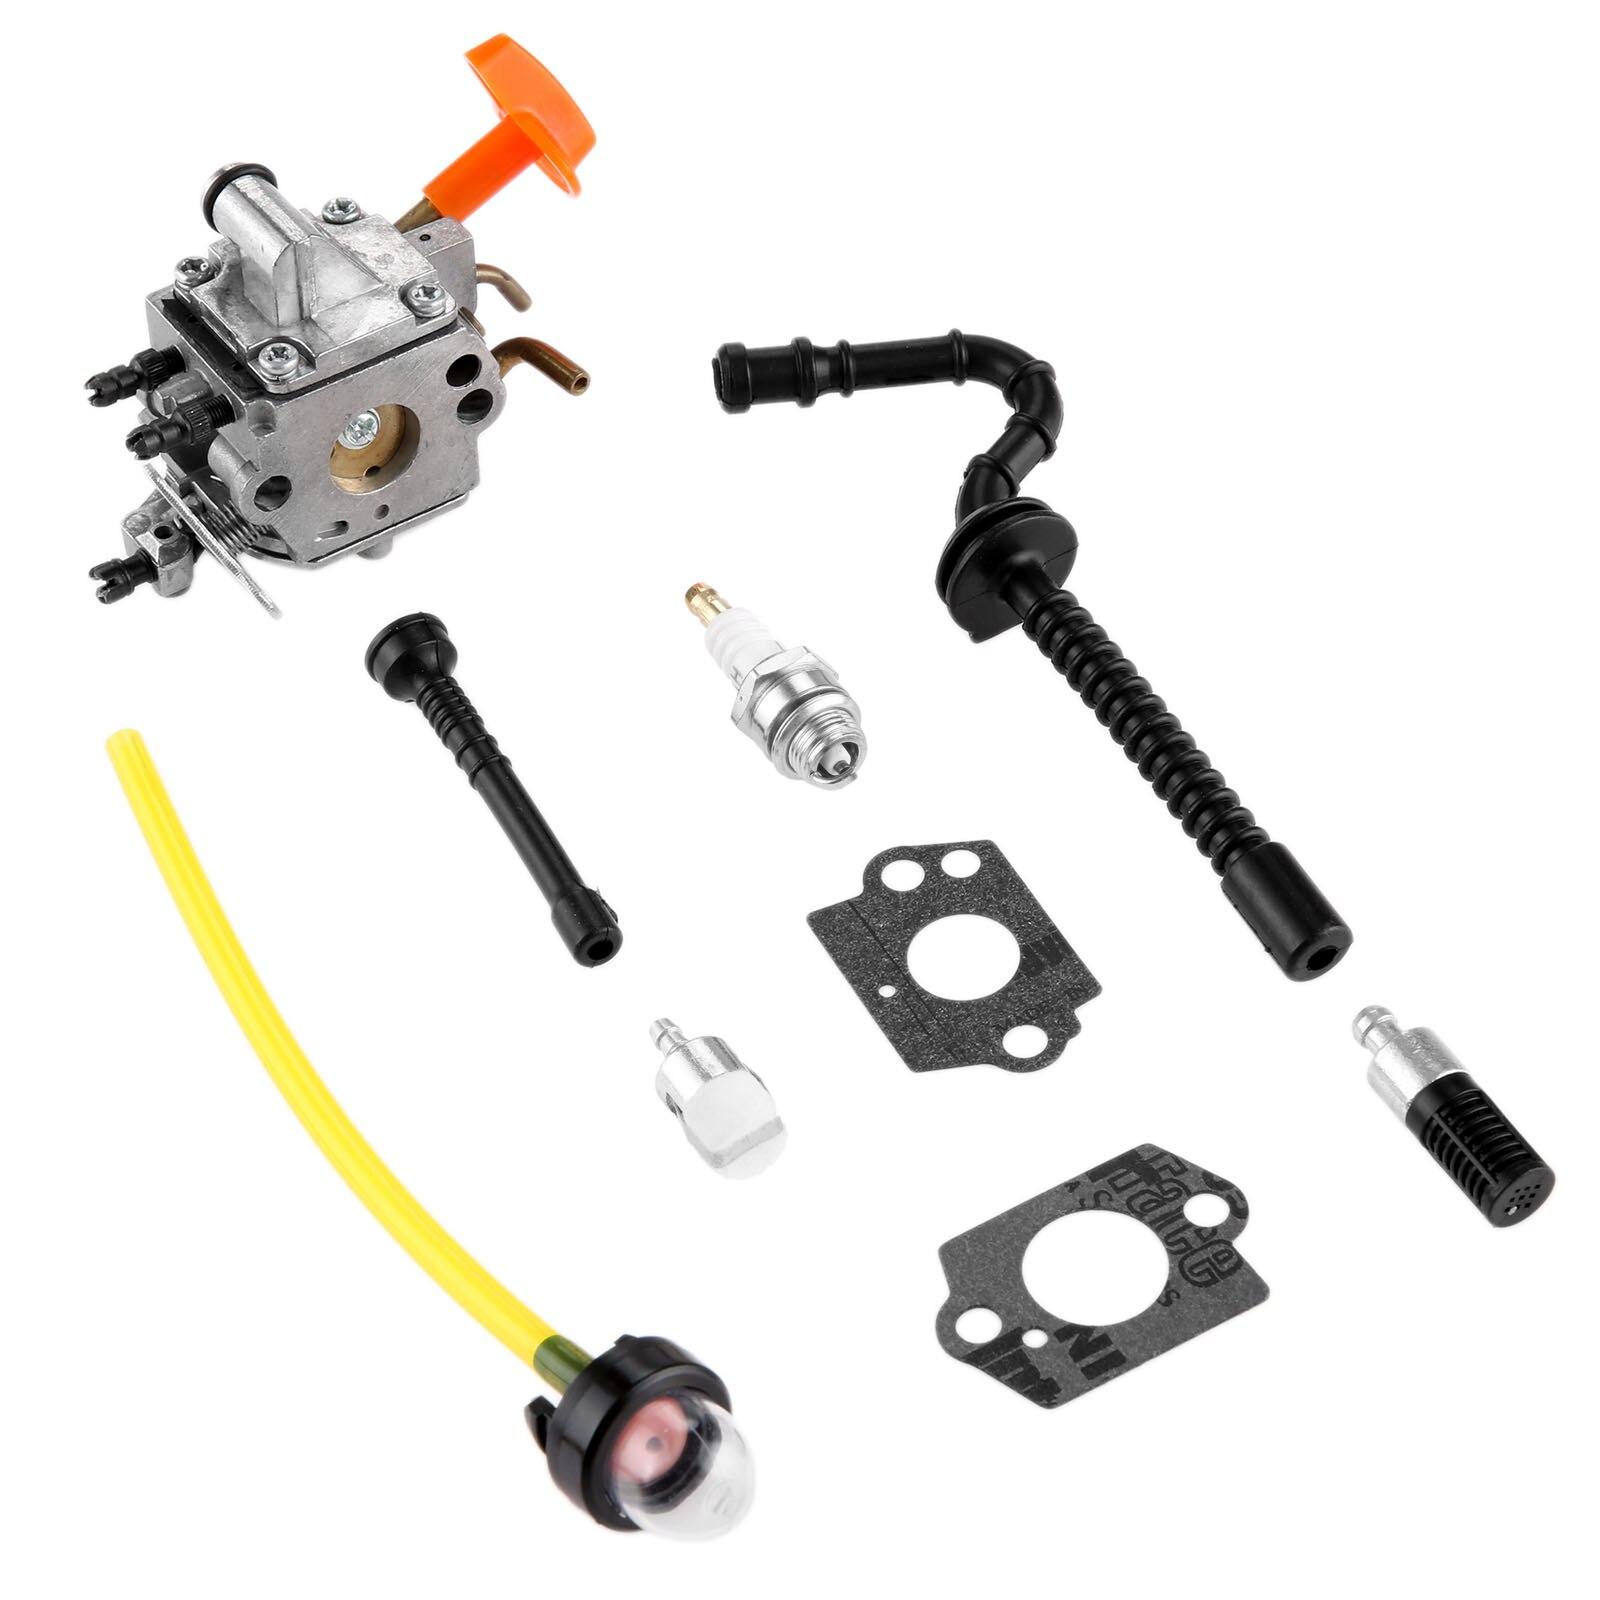 DRELD Carburetor Carb for Stihl MS192 MS192T MS192TC Chainsaw Zama C1Q S258 with Gasket Fuel Filter Hose Pimer Bulb Spark Plug